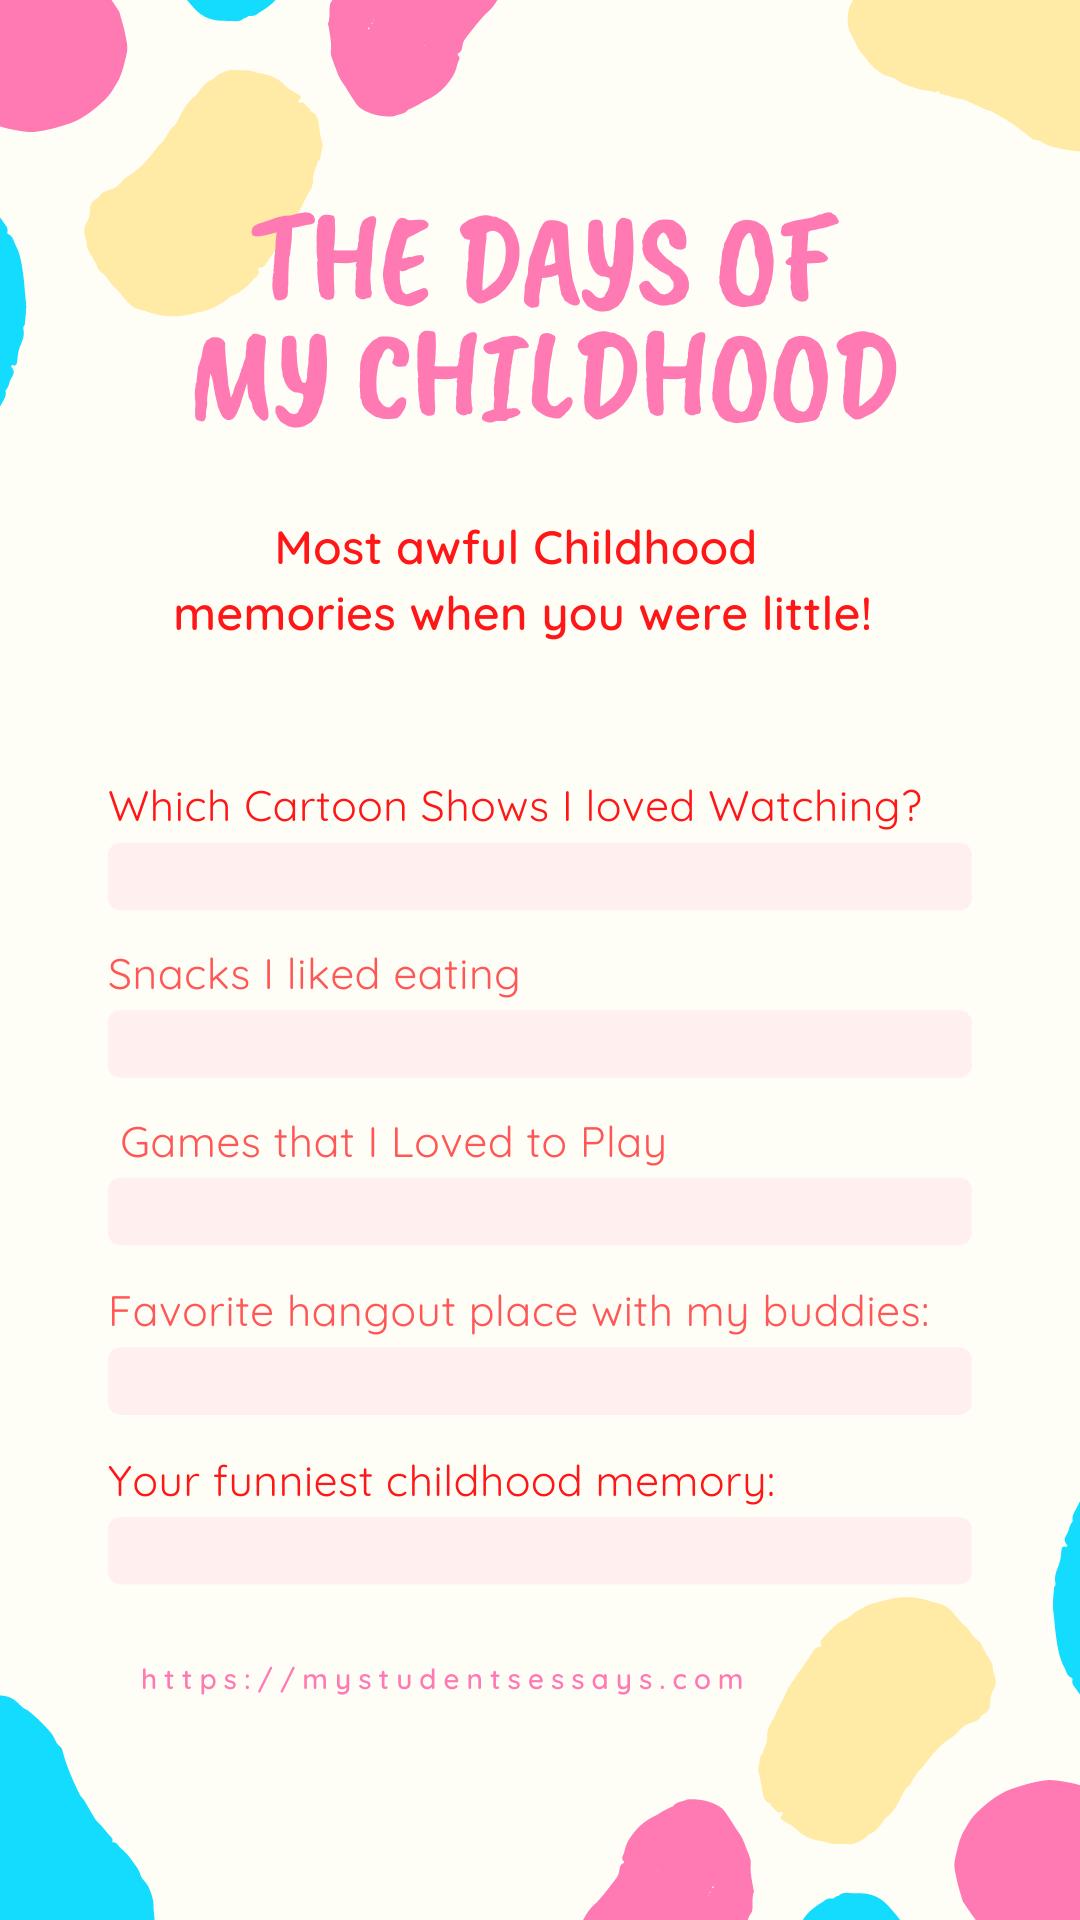 Funniest childhood memories essay